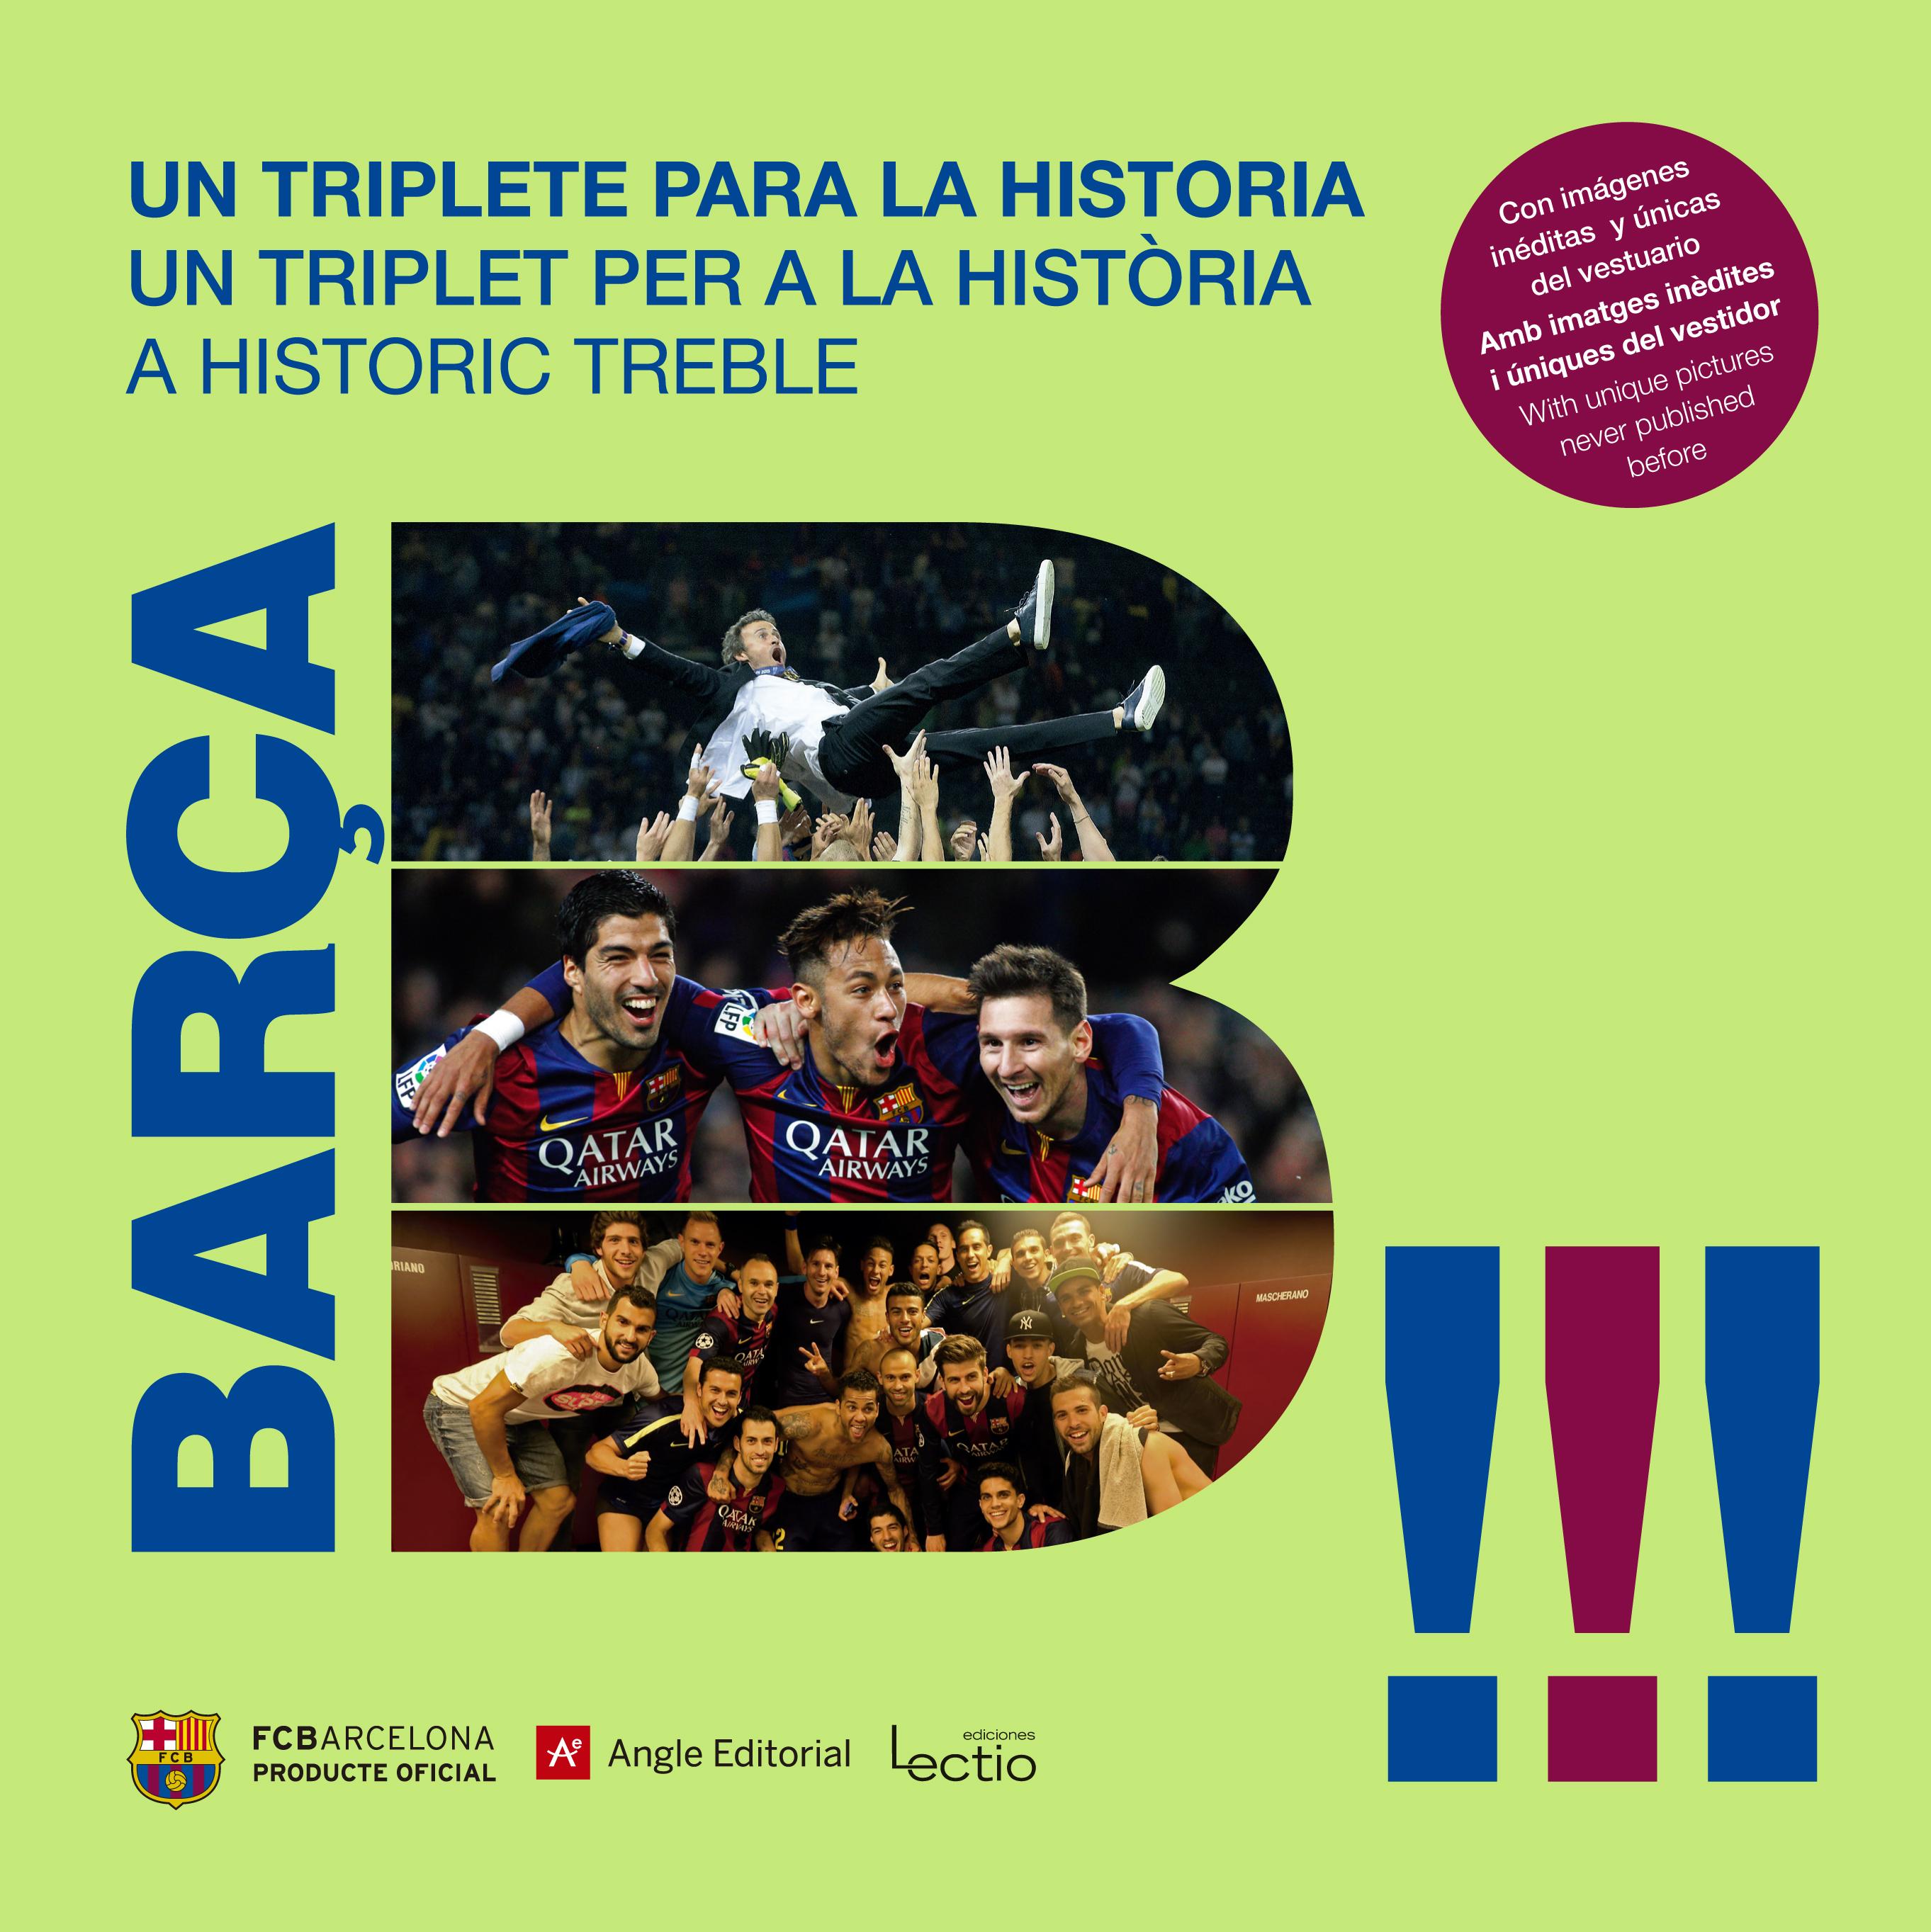 BARÇA: UN TRIPLETE PARA LA HISTORIA